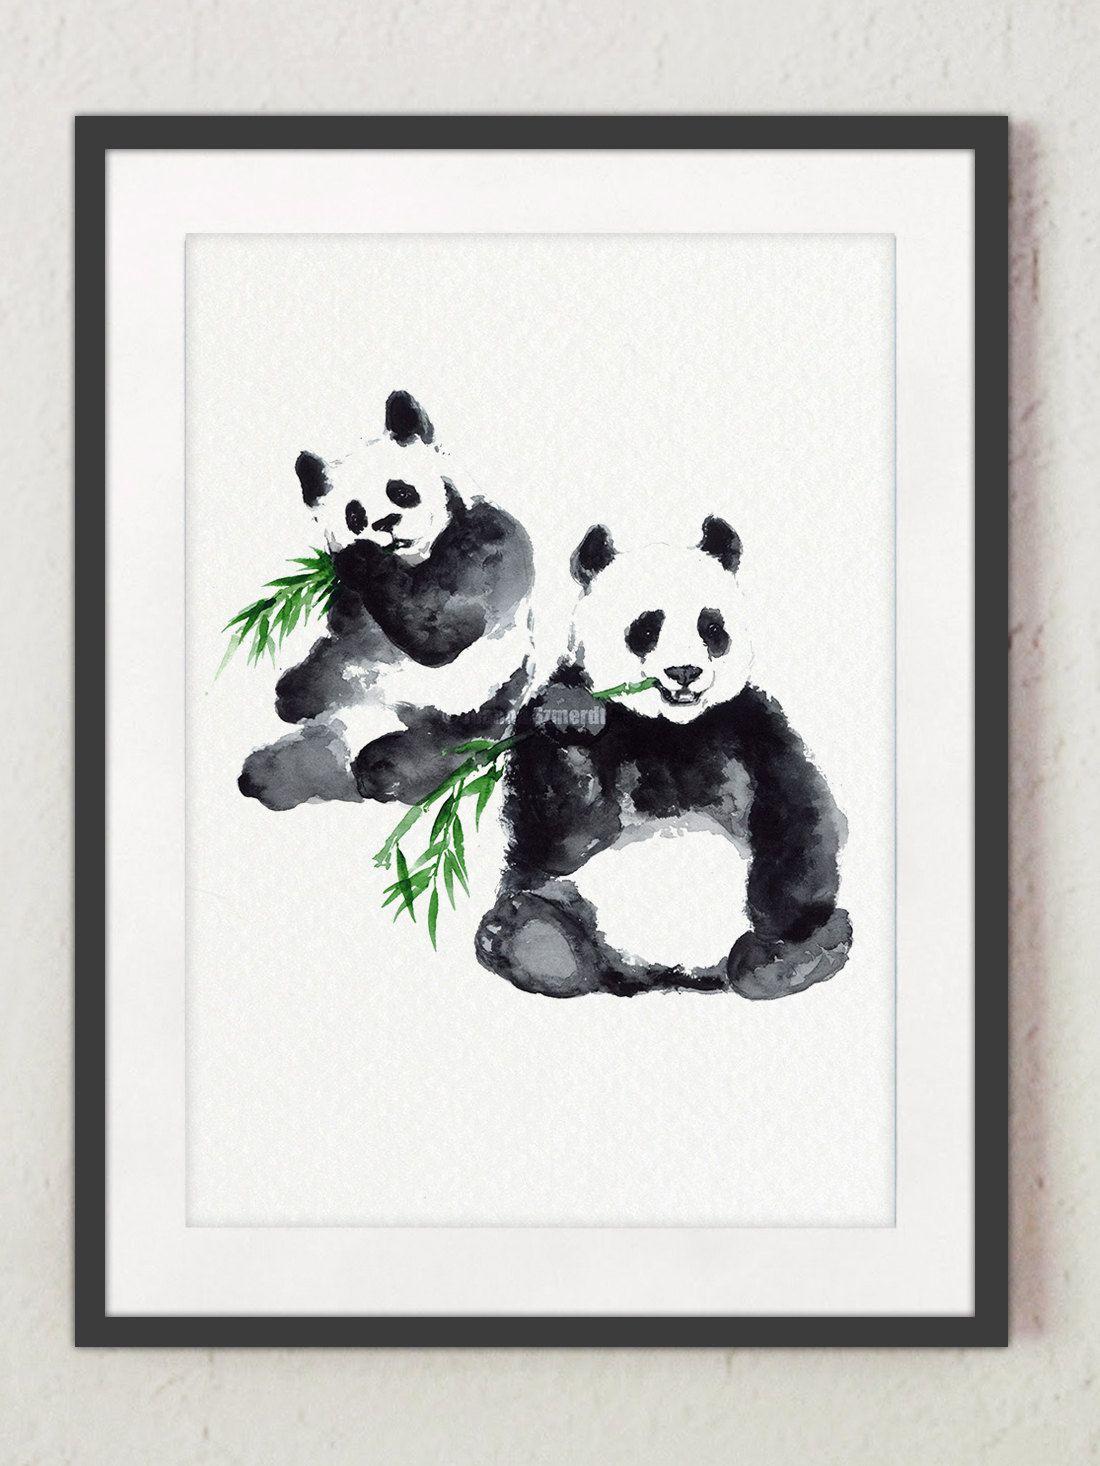 Panda Sleeping Watercolour Art Print Framed Poster Wall Decor